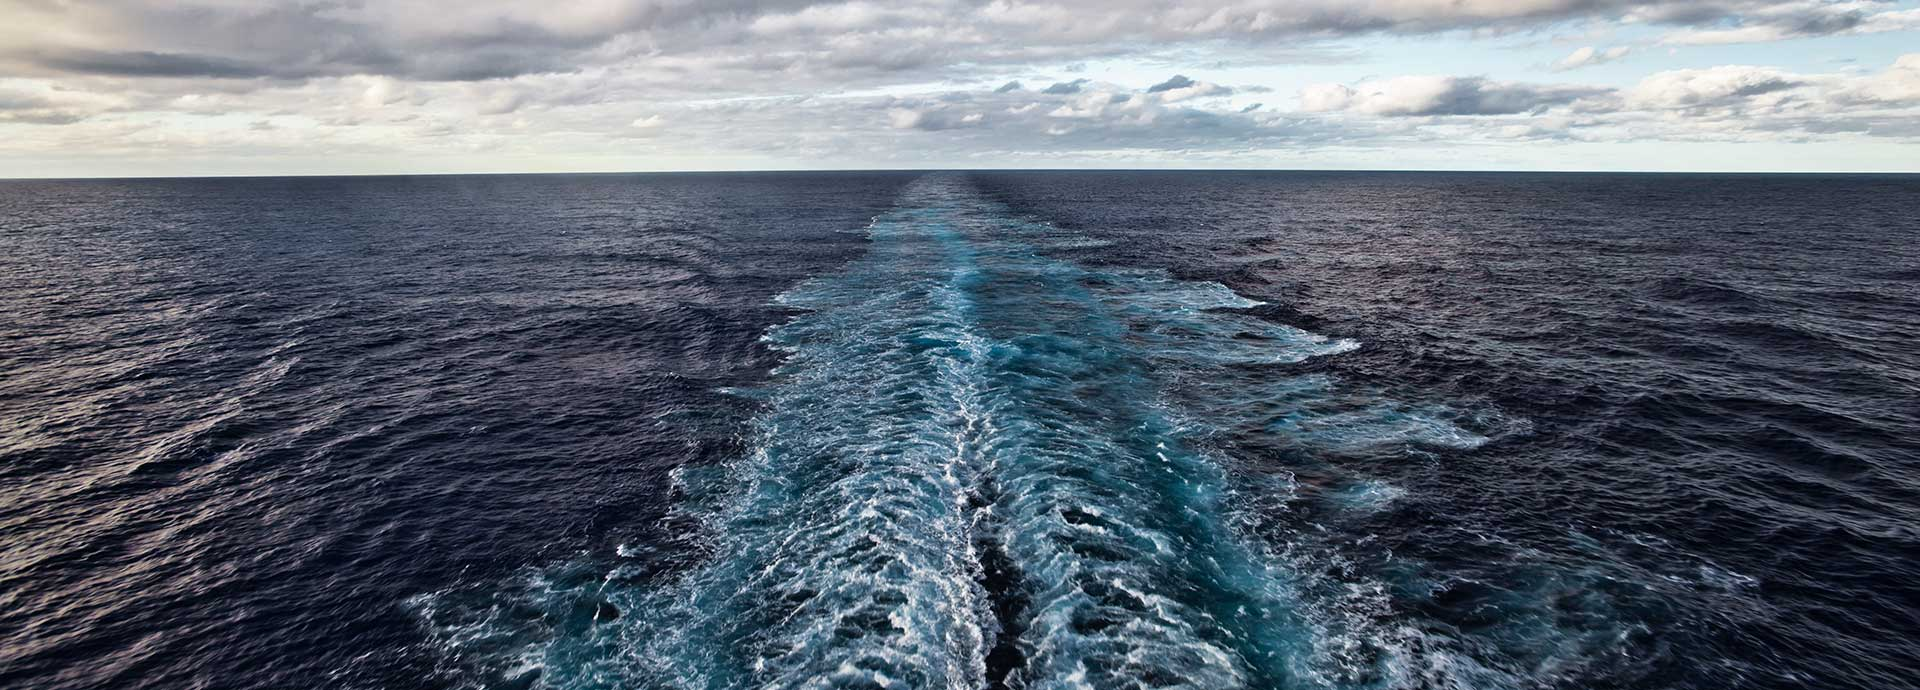 A sea-change in improving energy efficiency